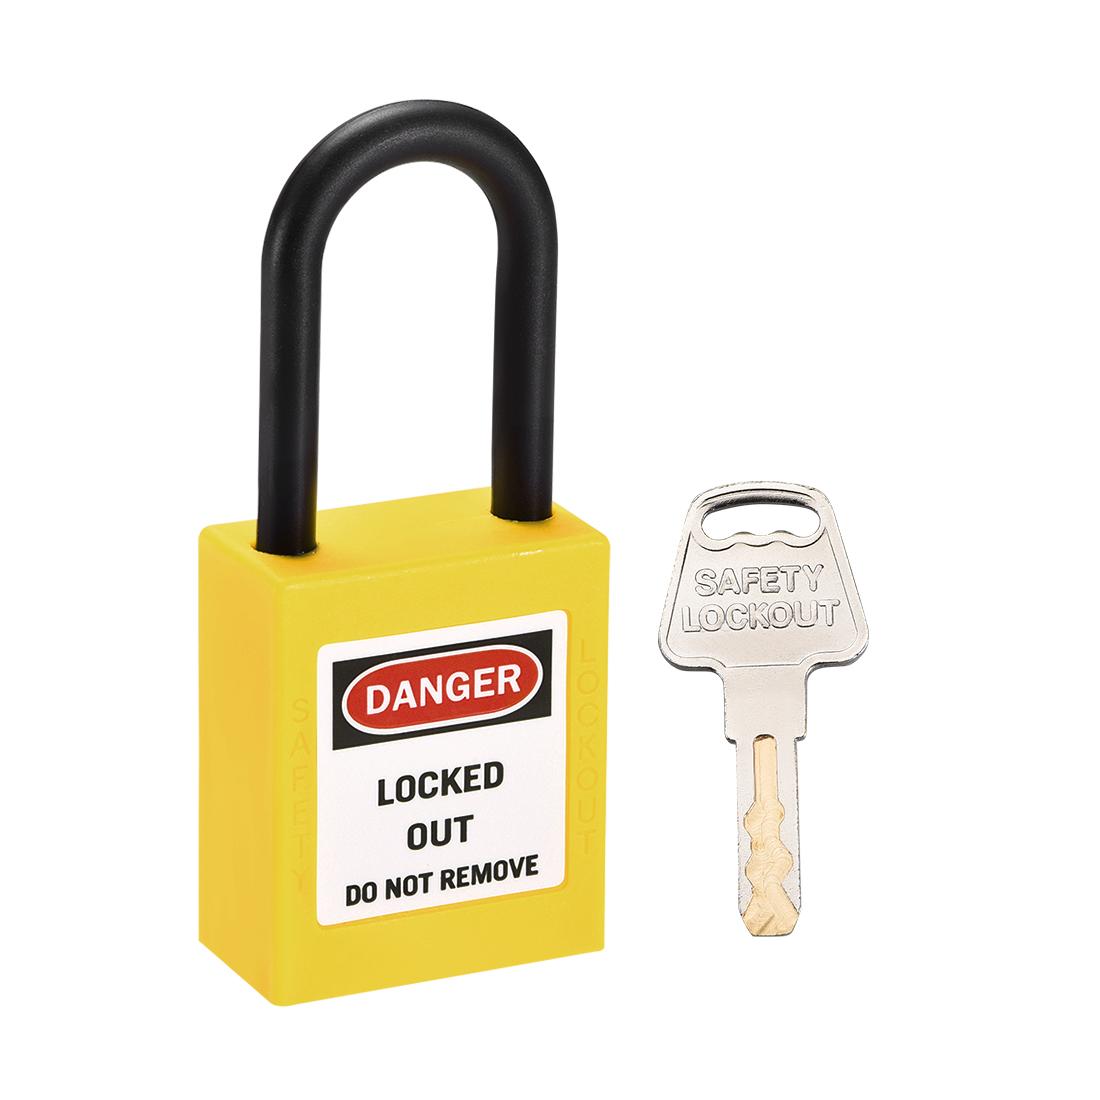 Lockout Tagout Locks,1-1/2 Inch Shackle Key Alike Safety Padlock Yellow